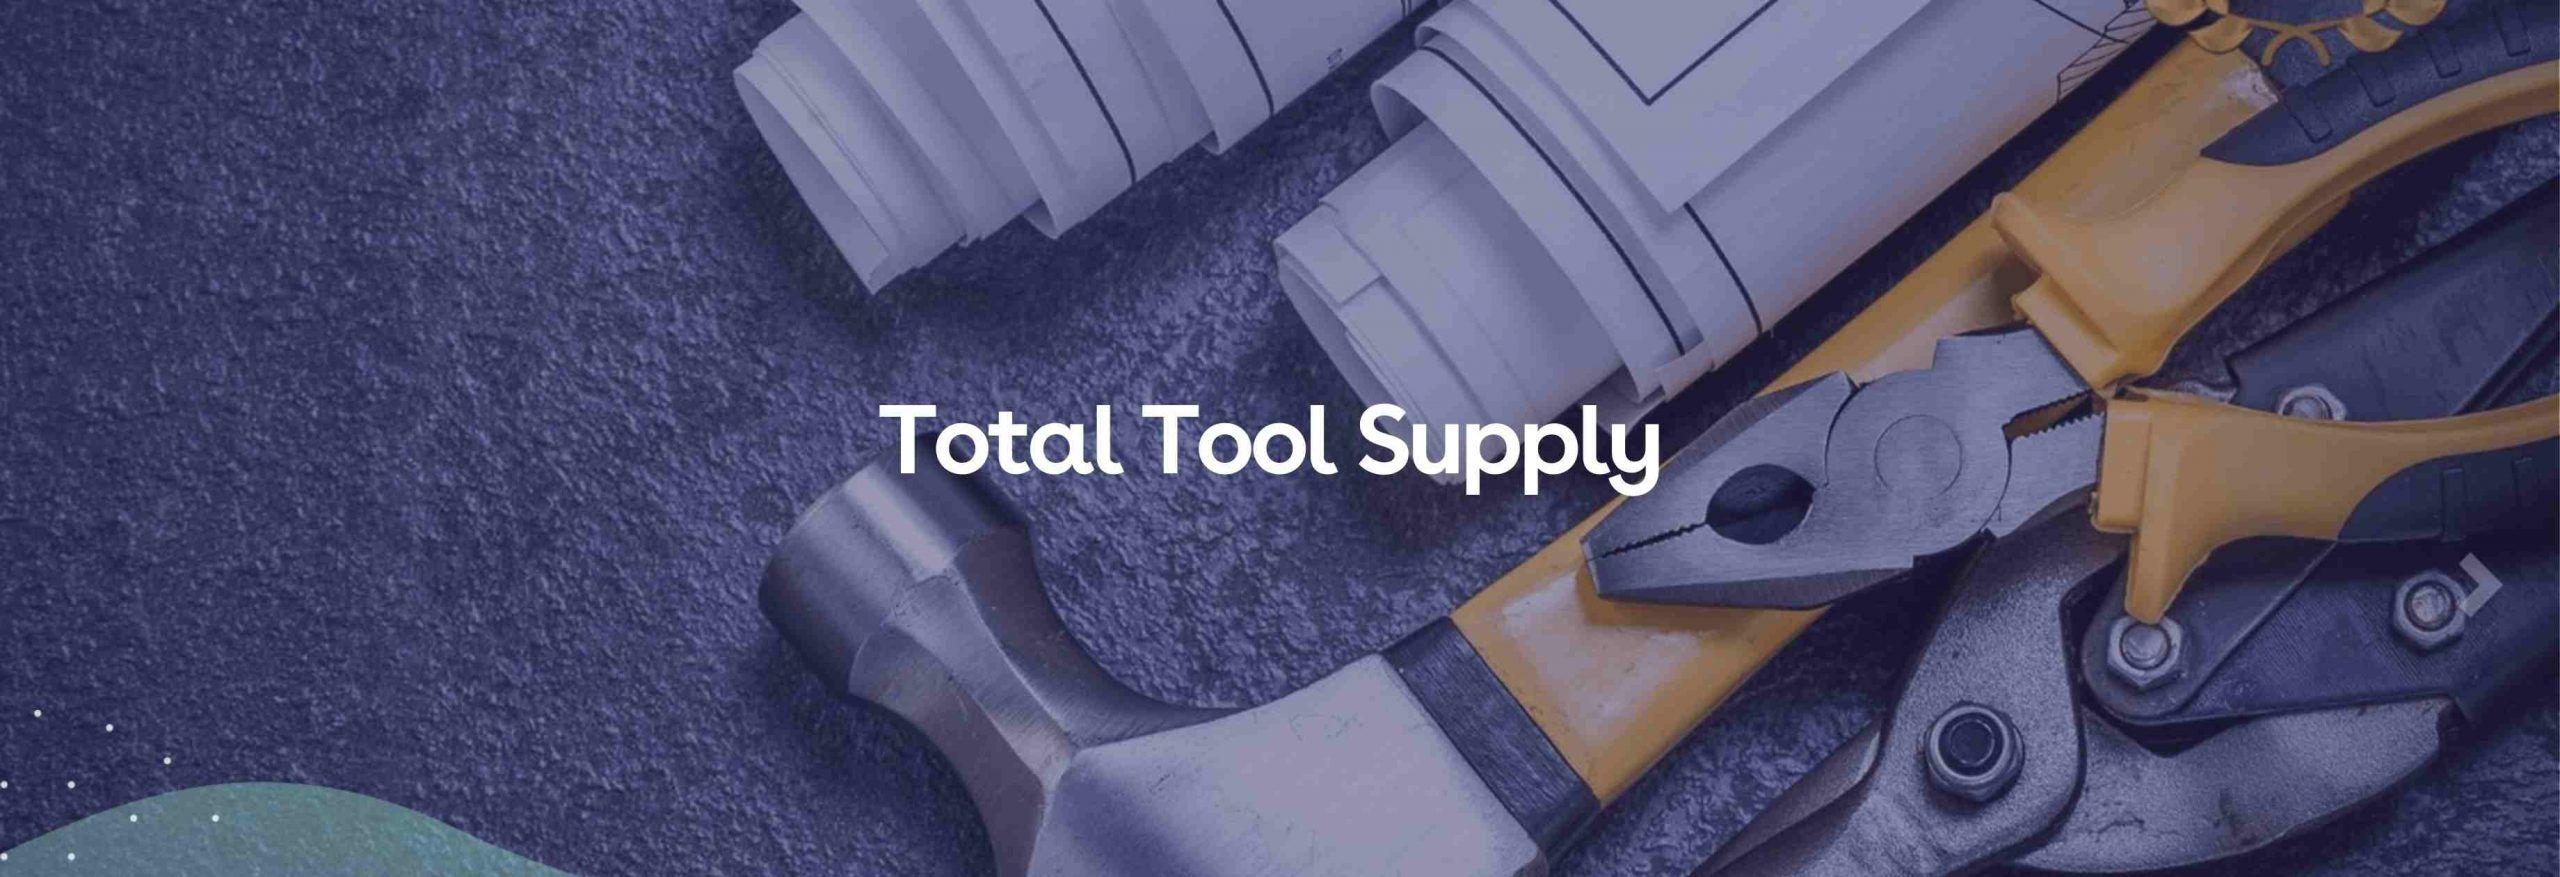 total tool